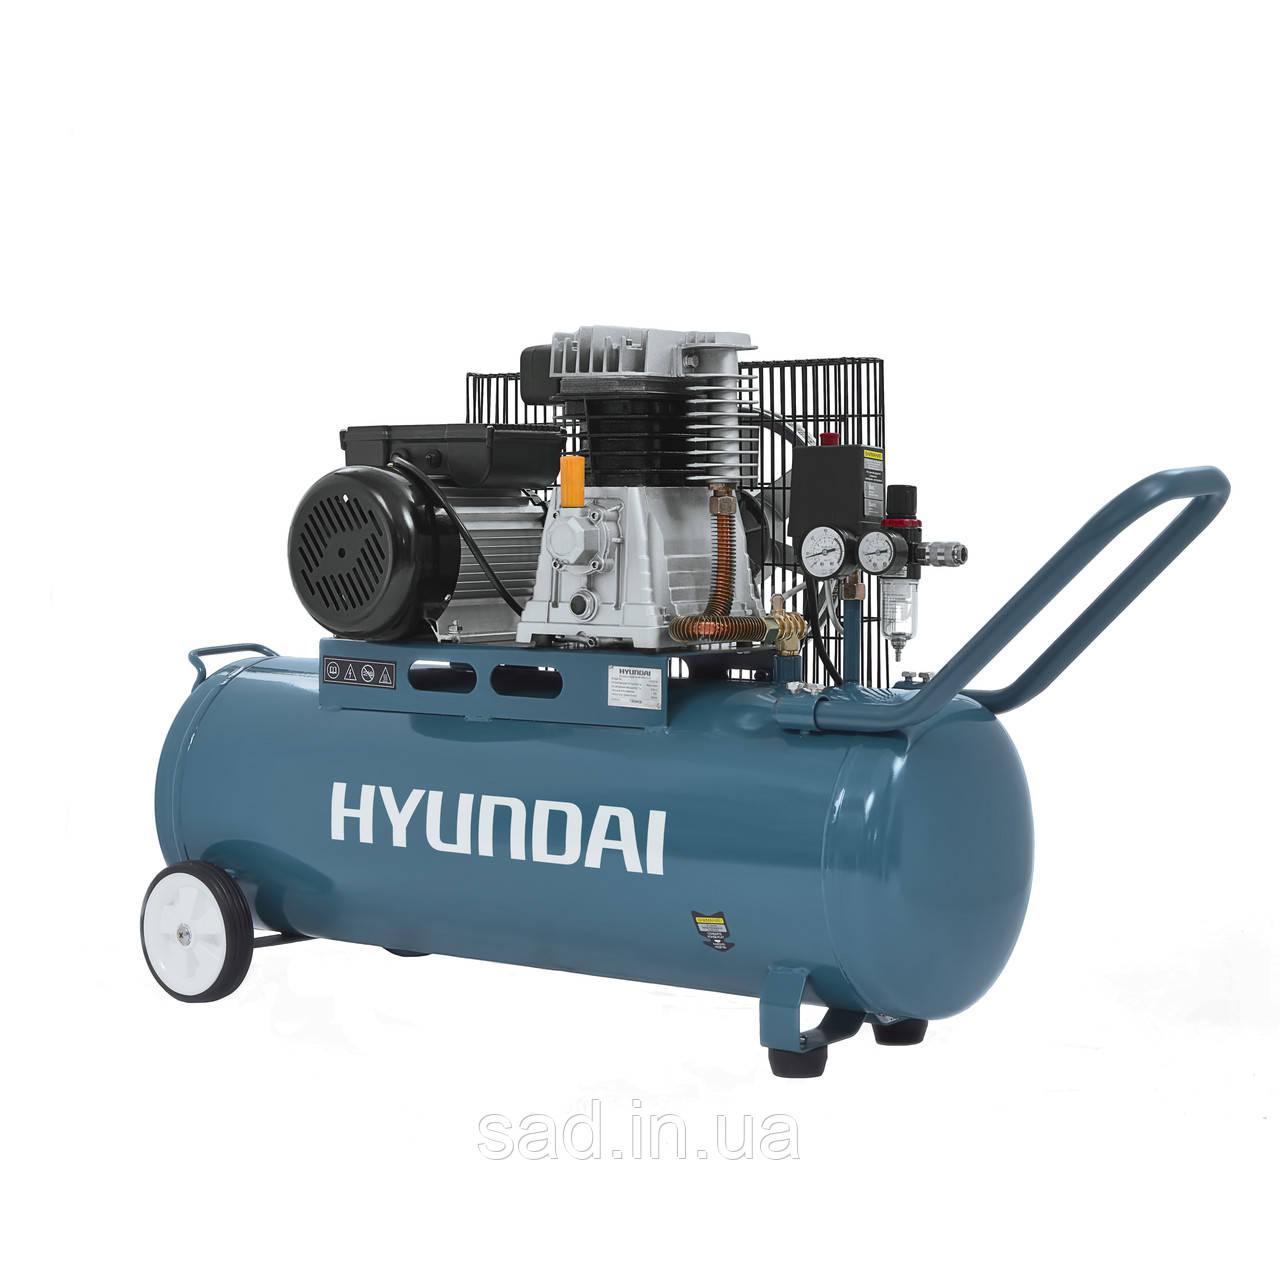 Компрессор Hyundai HYC 2575  (400 л/мин) - Sadovod.in.ua в Никополе